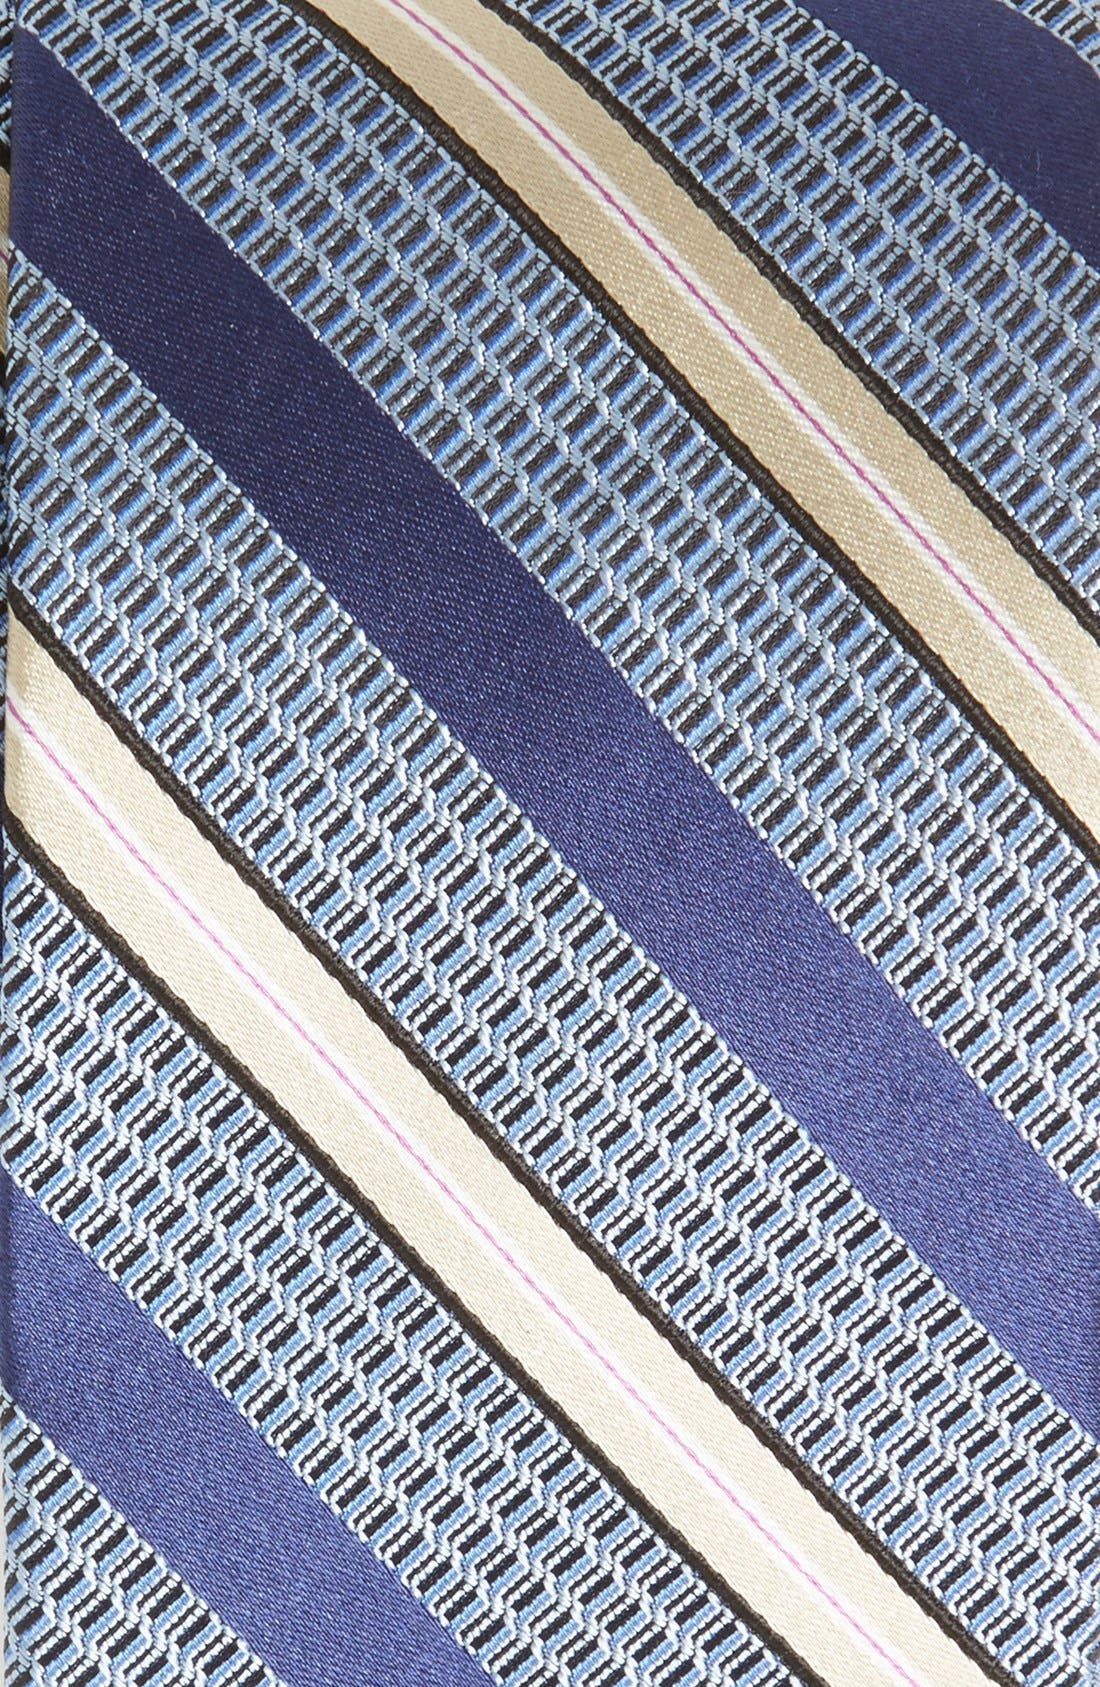 Woven Silk Tie,                             Alternate thumbnail 2, color,                             400